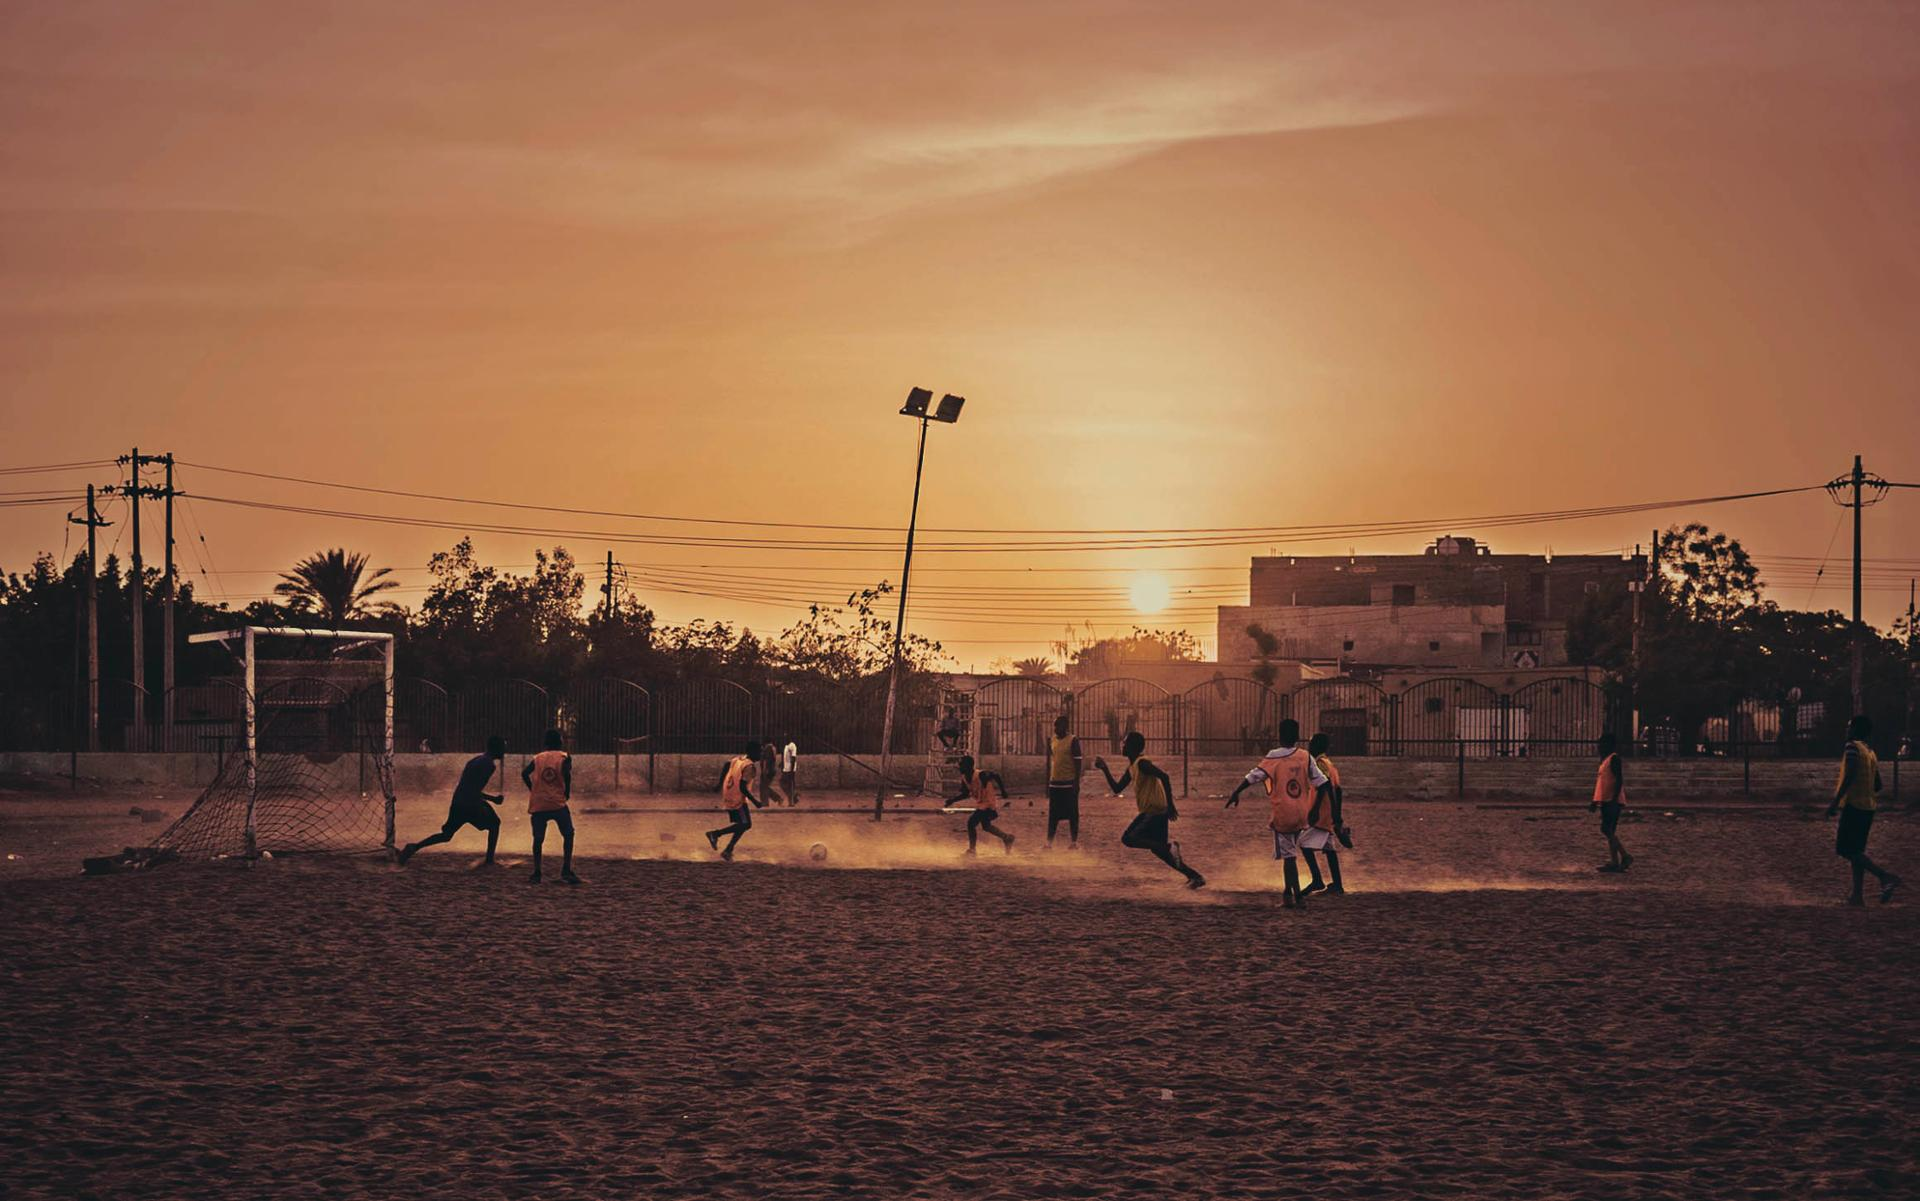 Sudan kids playing football at sunset